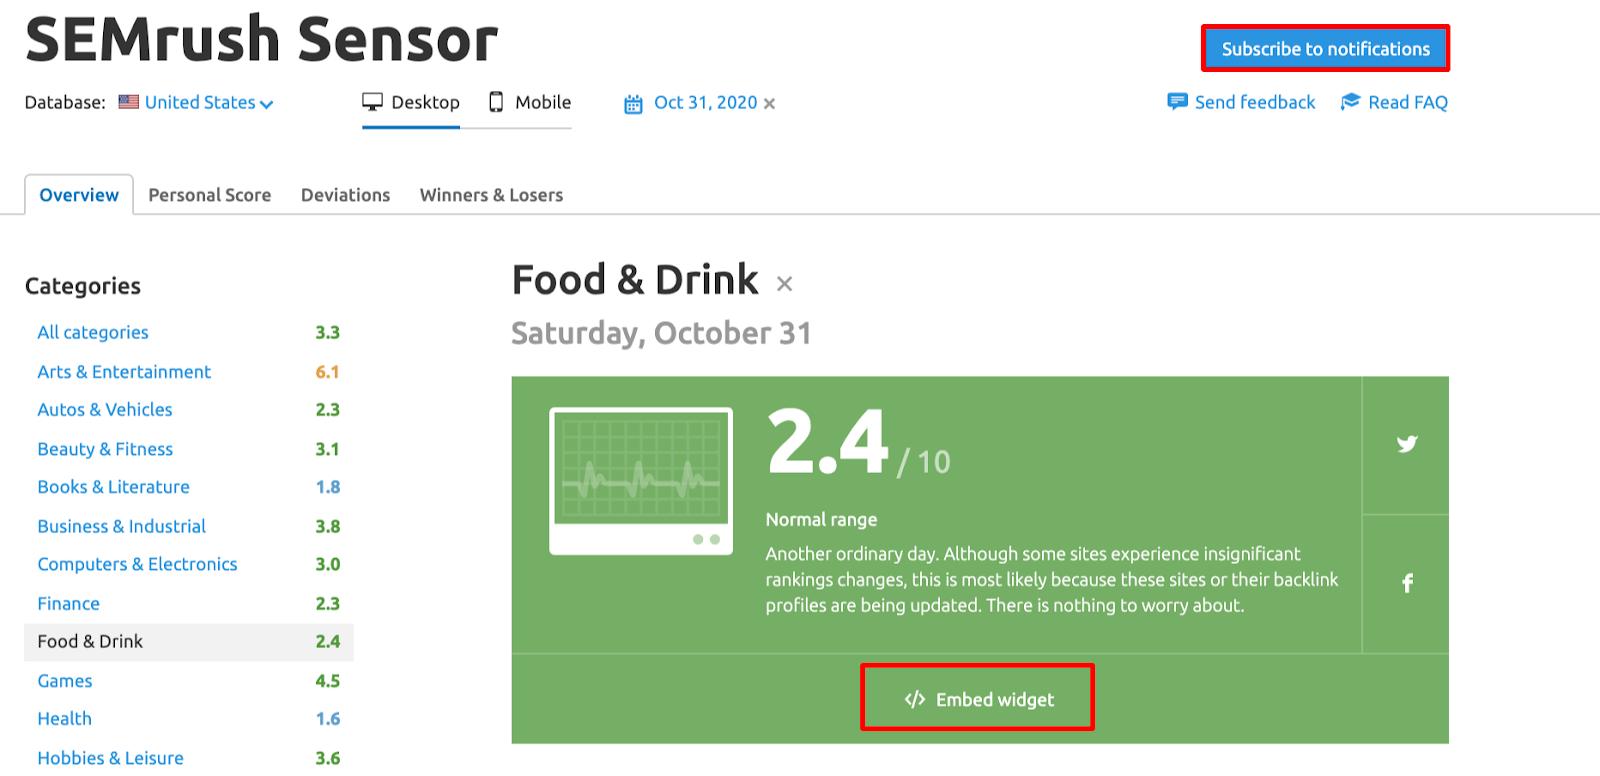 SEMrush Sensor Categories